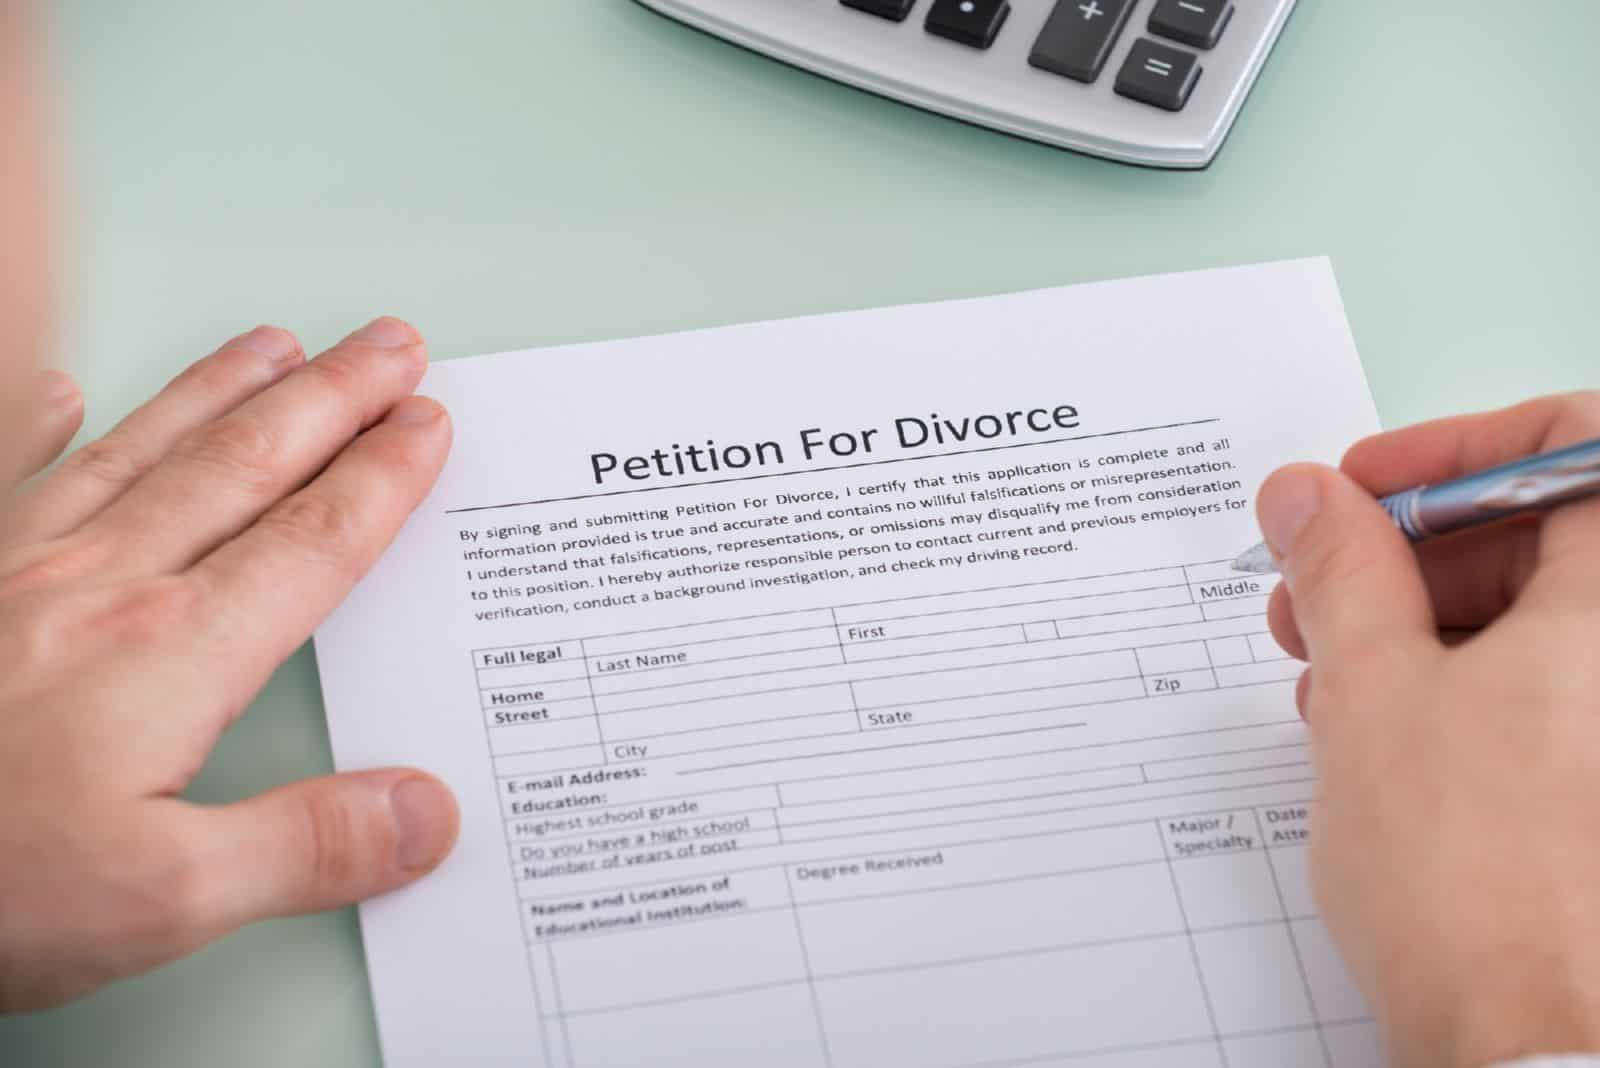 заявление на развод образец 2017 через загс